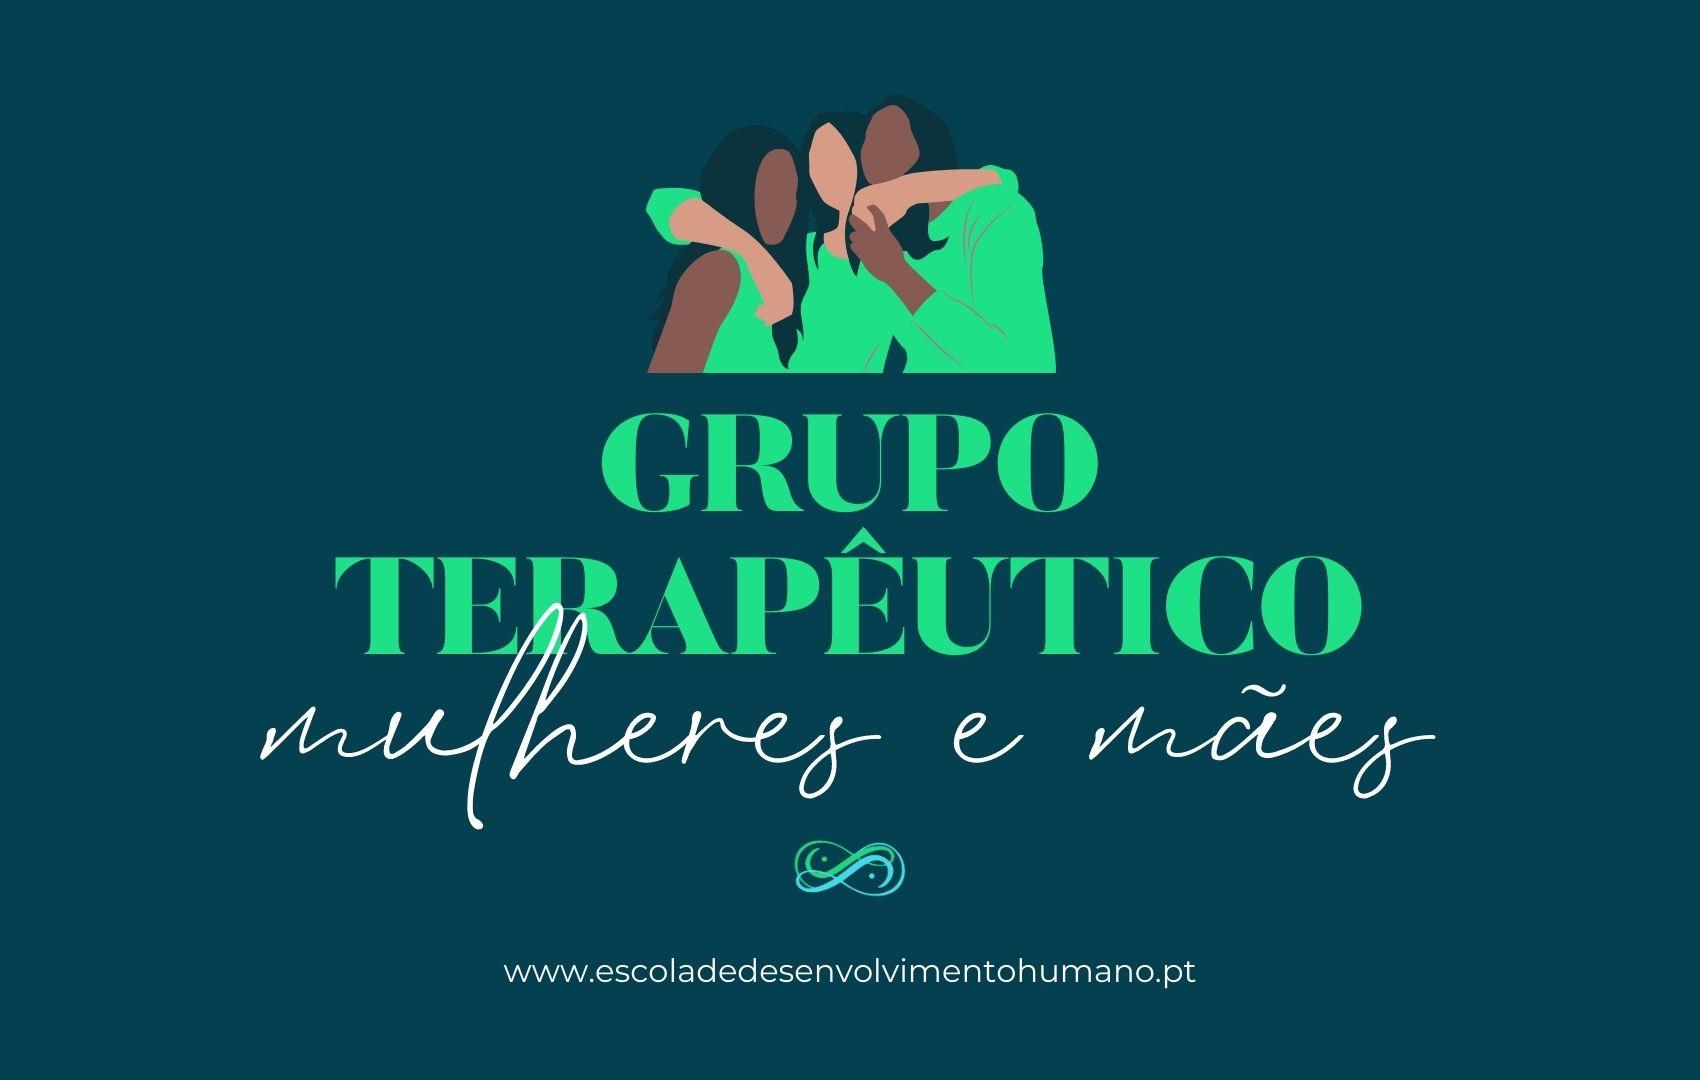 Grupo terapêutico